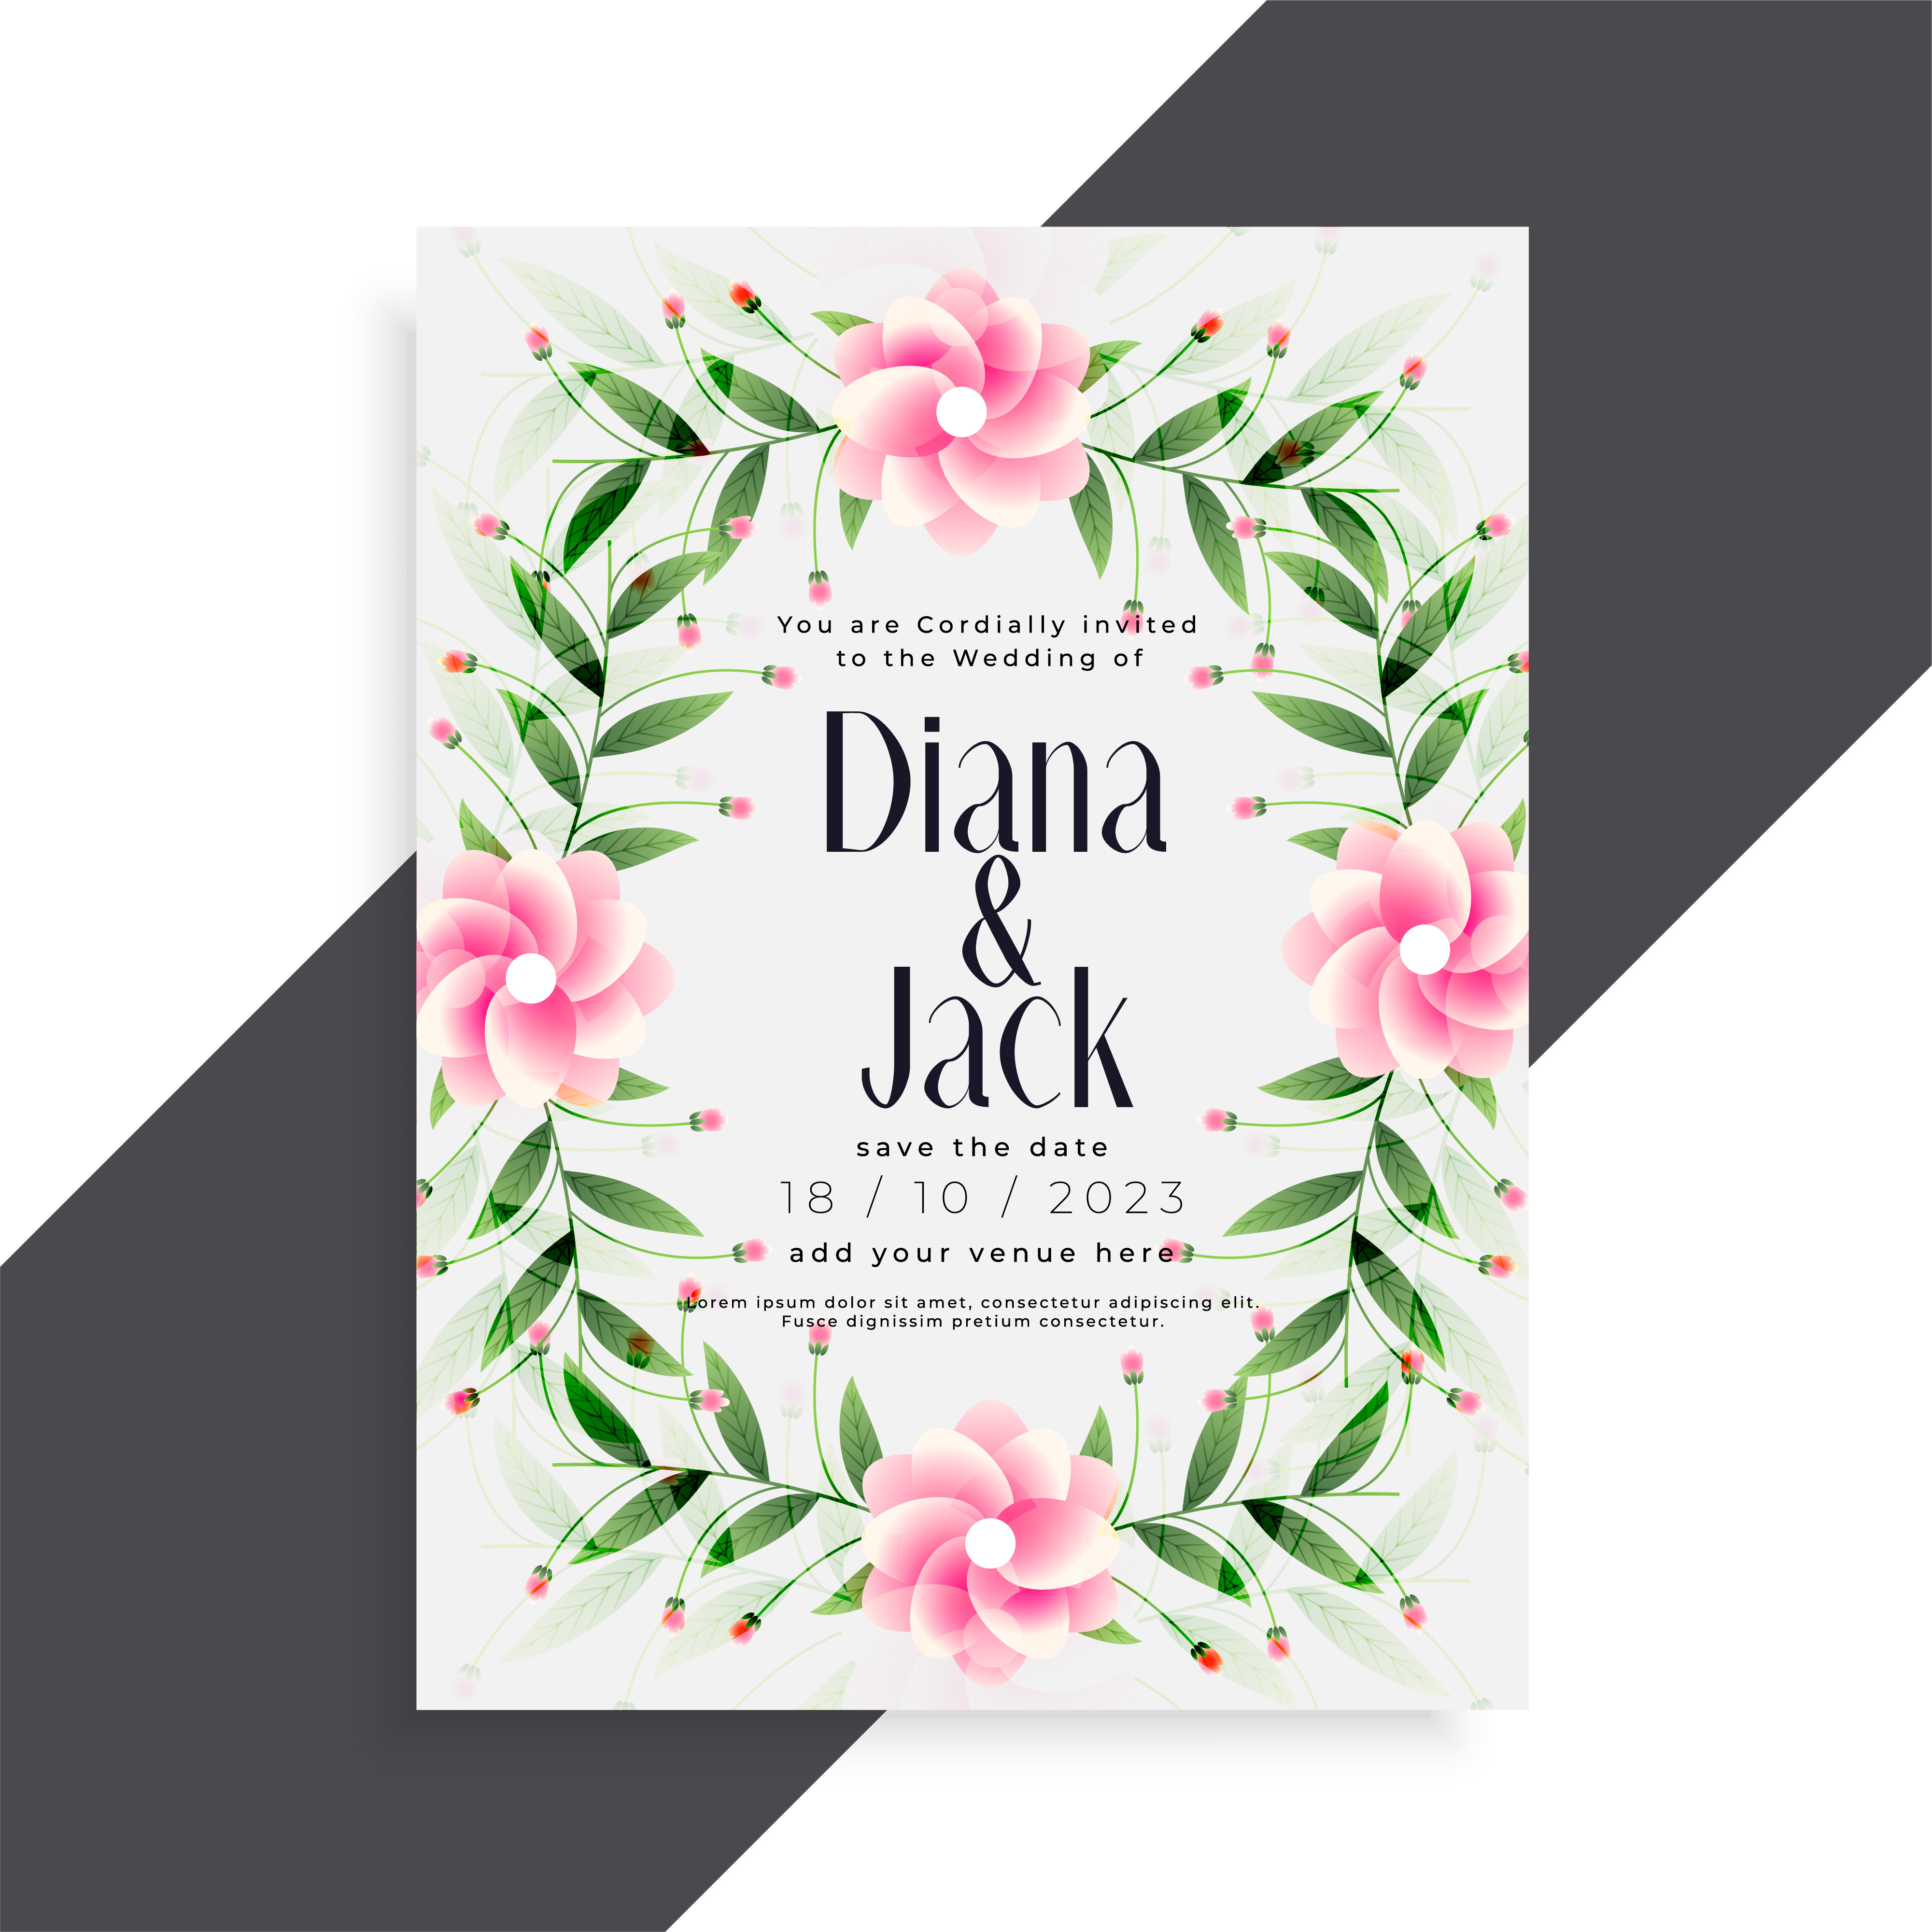 Beautiful wedding invitation pink flower card design download free beautiful wedding invitation pink flower card design download free vector art stock graphics images izmirmasajfo